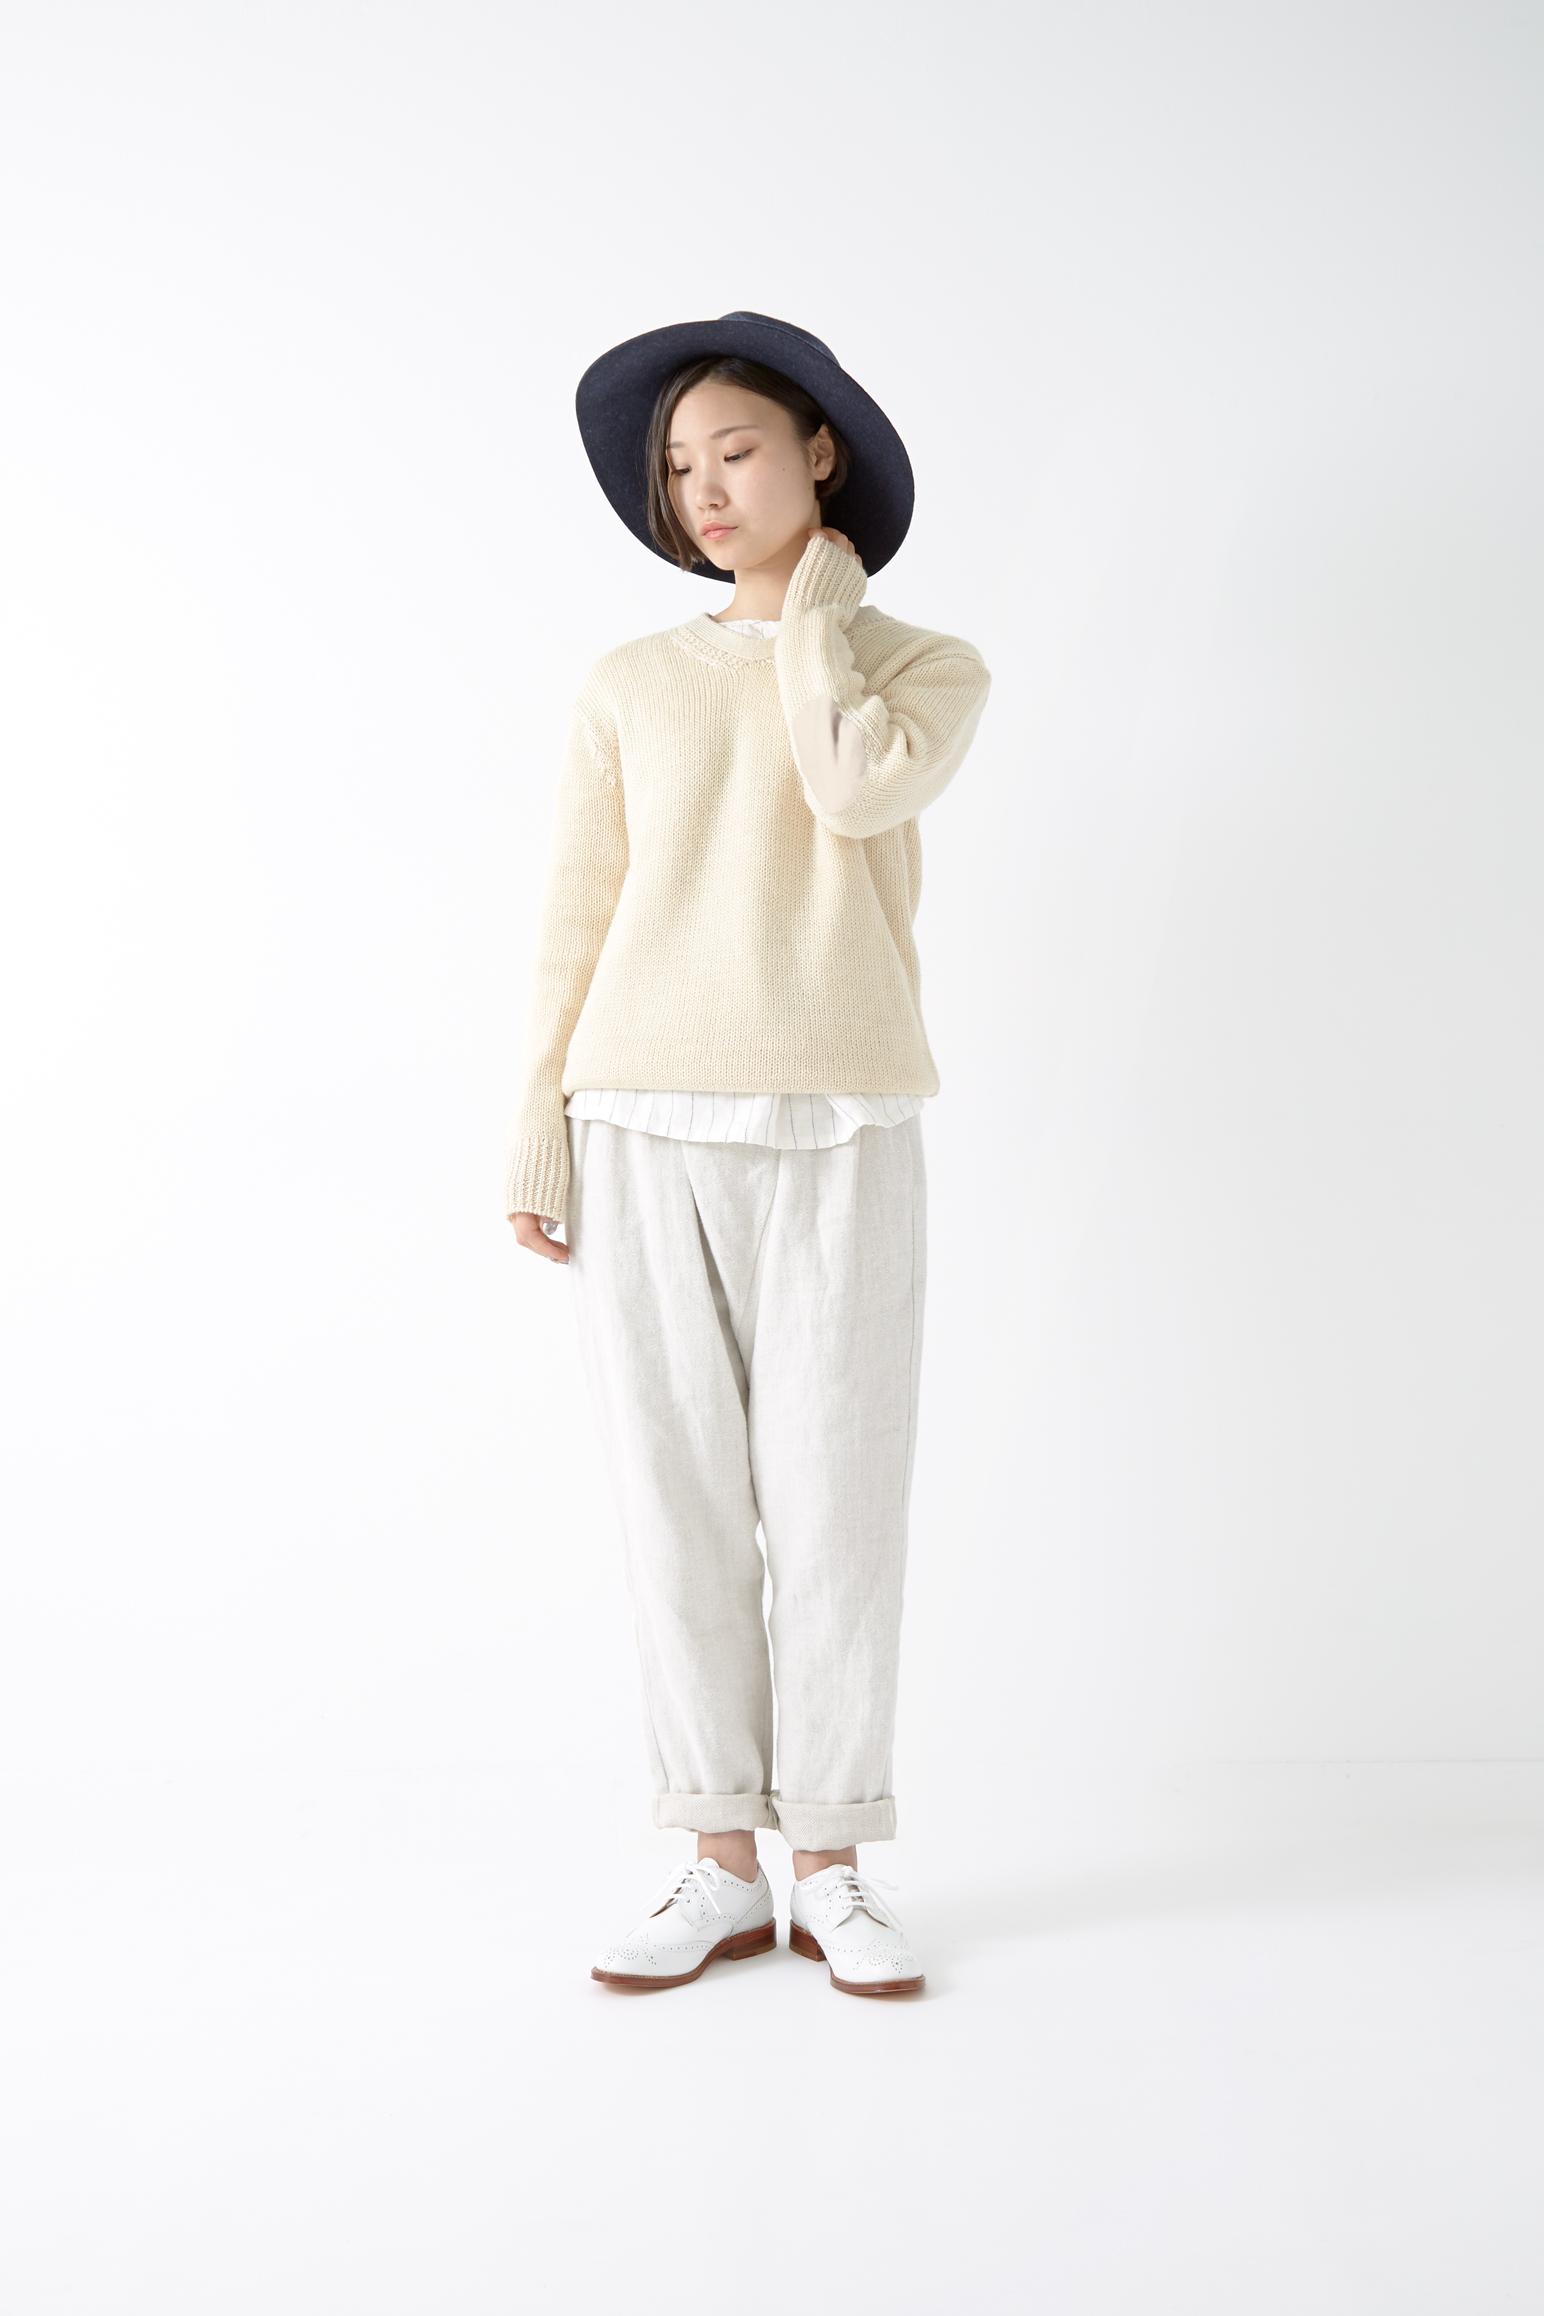 siiwa 2014-15A/W style01-02